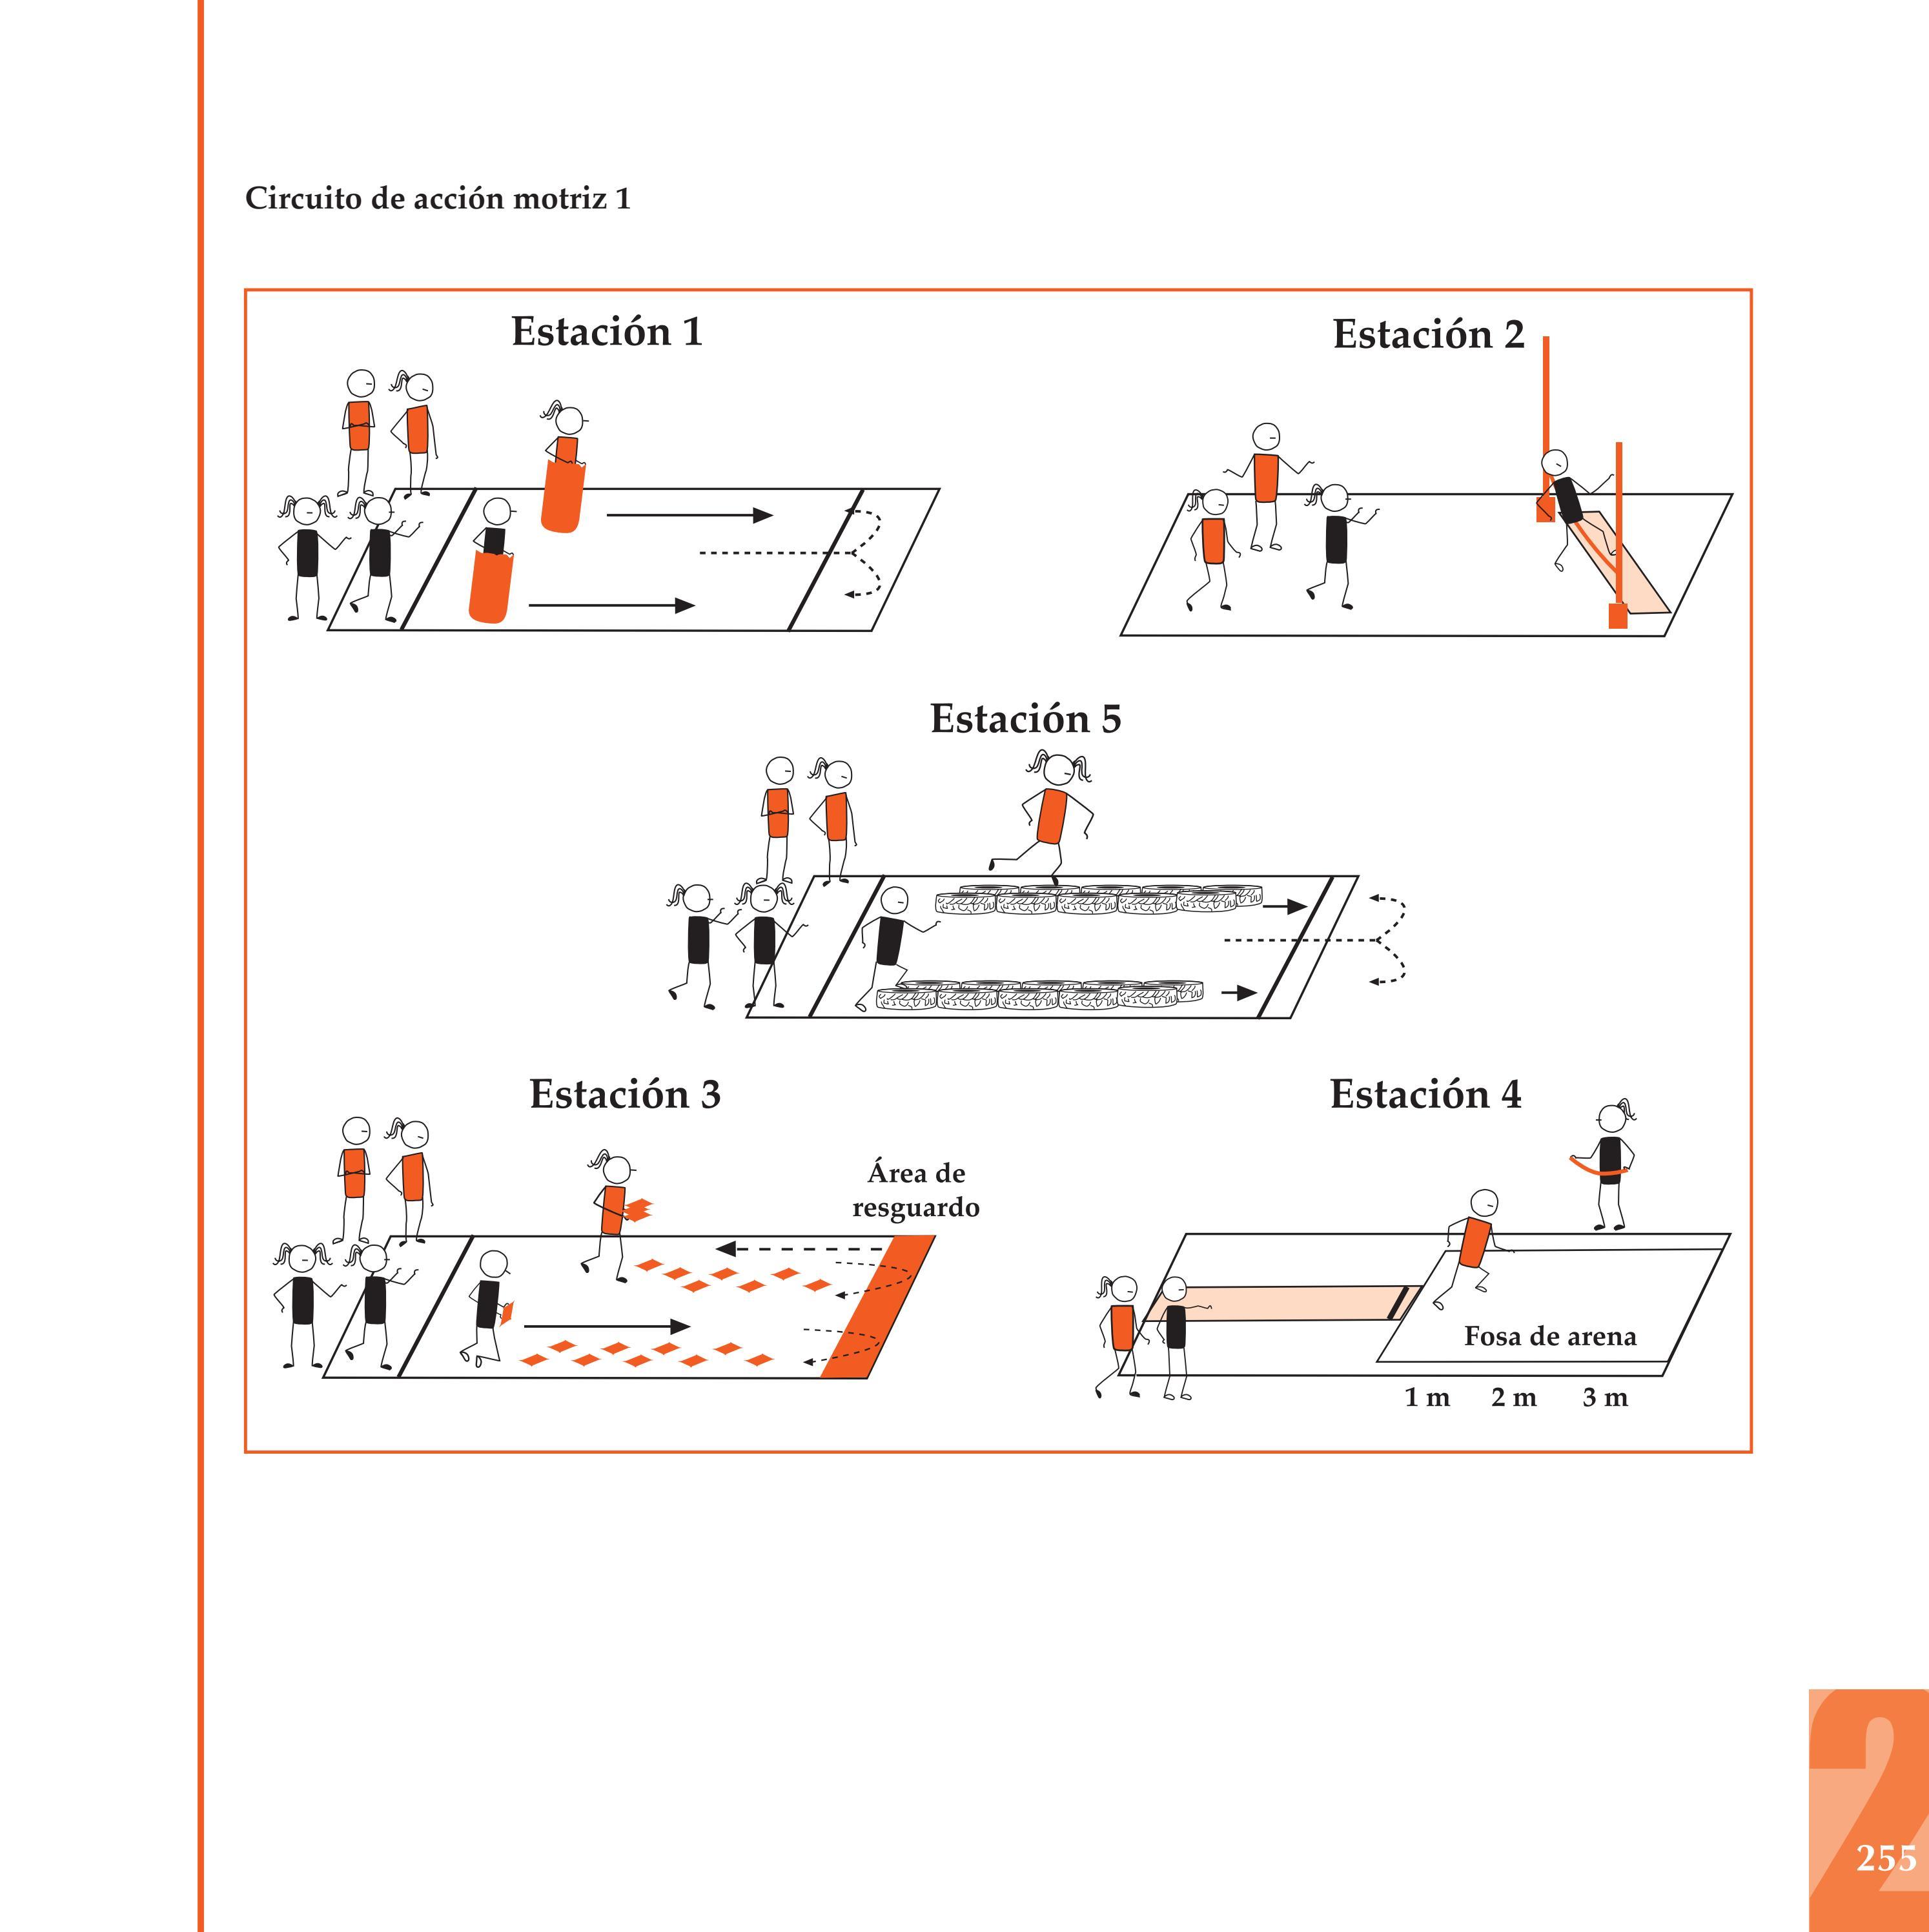 Circuito Motriz : Programa de educación física para secundaria by ivette